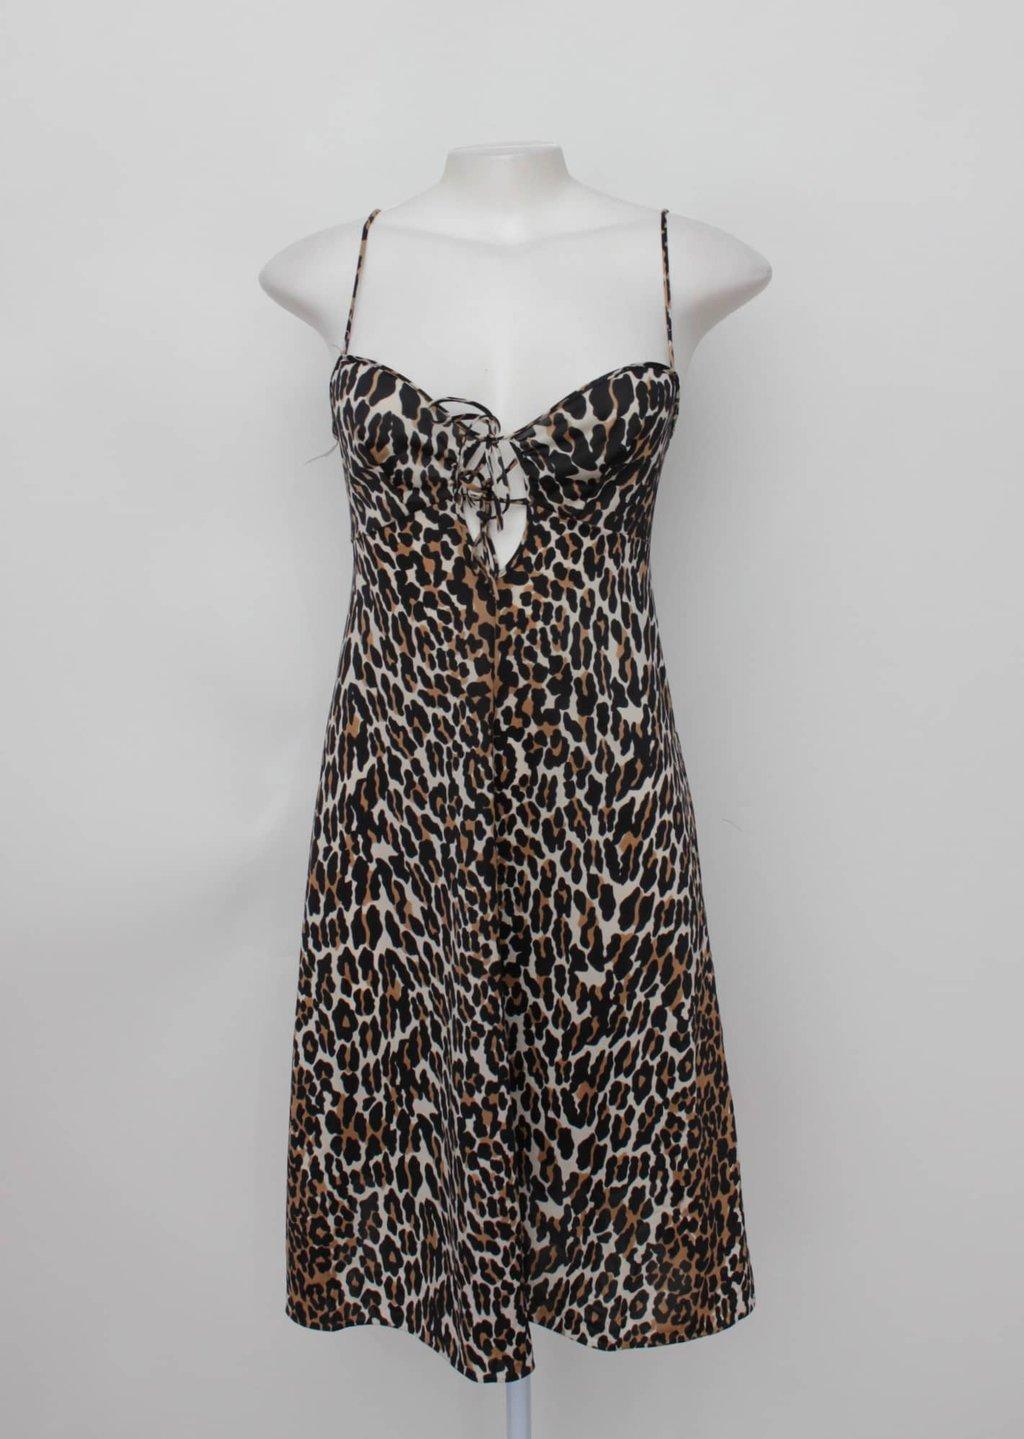 Camisola feminina animal print